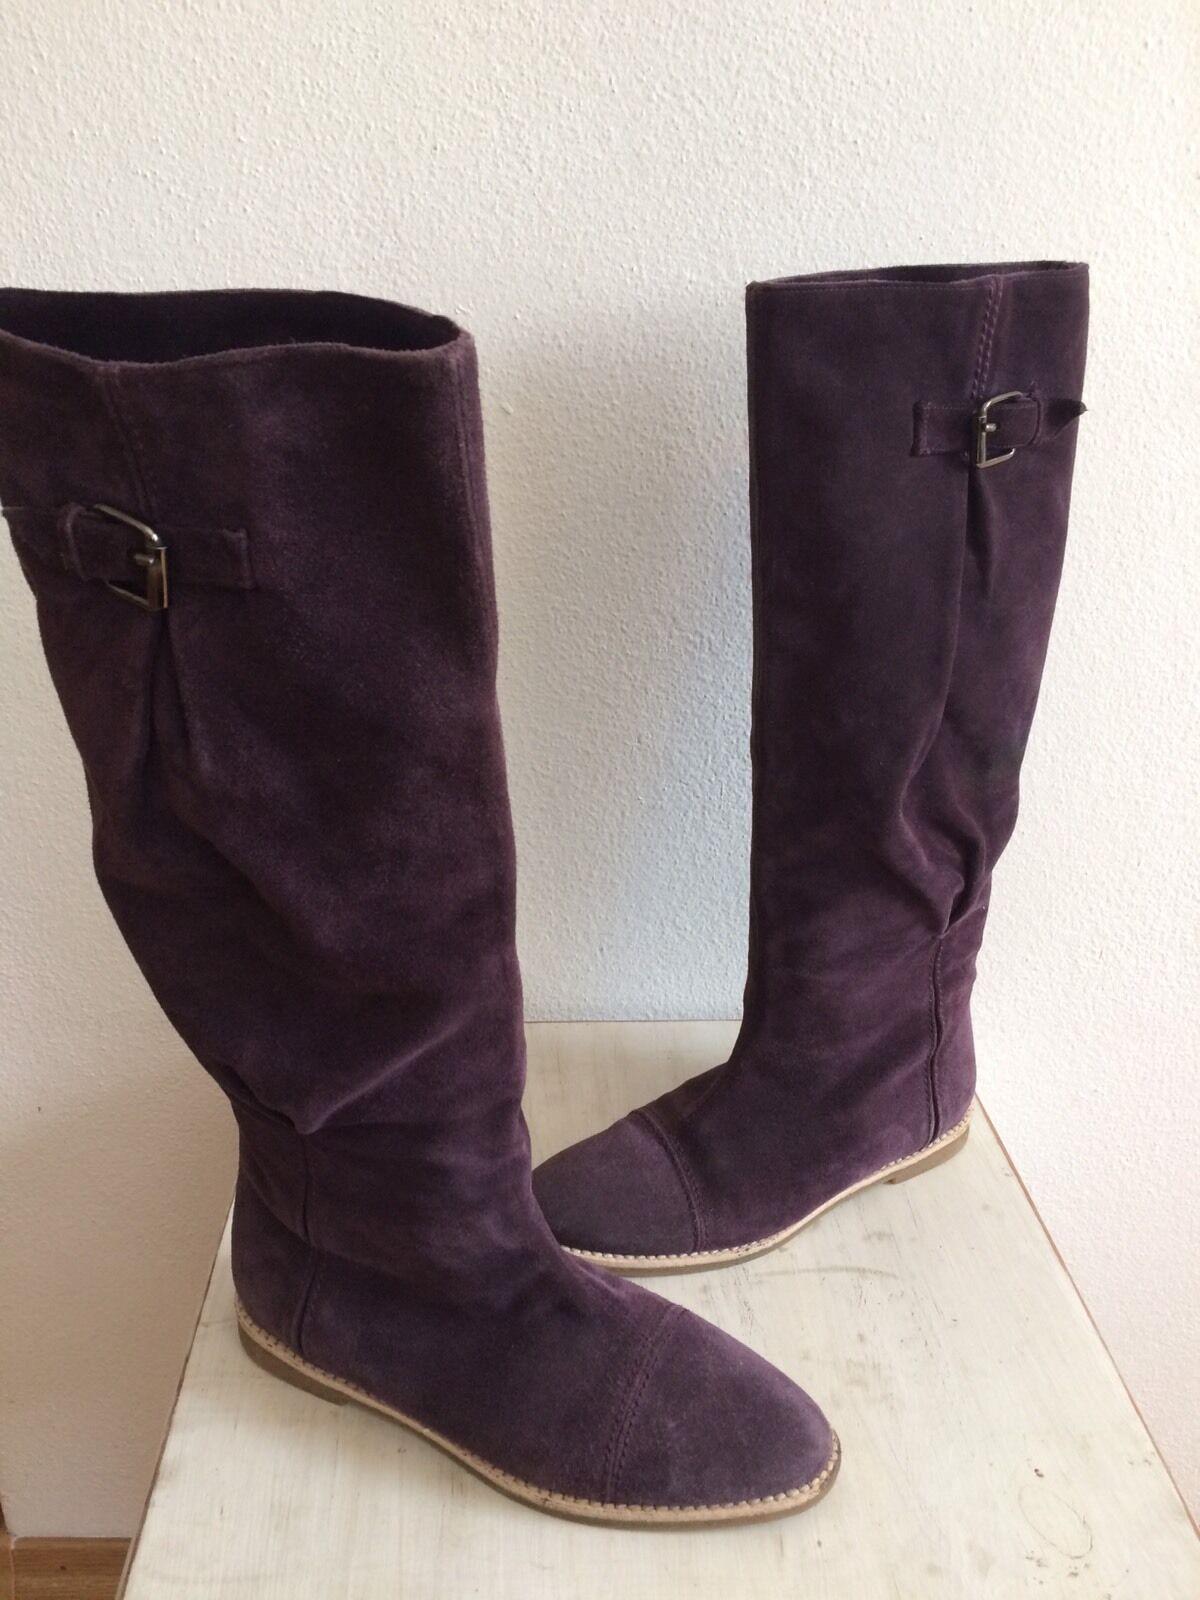 Wild Leder Stiefel zu Jeans Hose Rock Gr. 37 Conleys